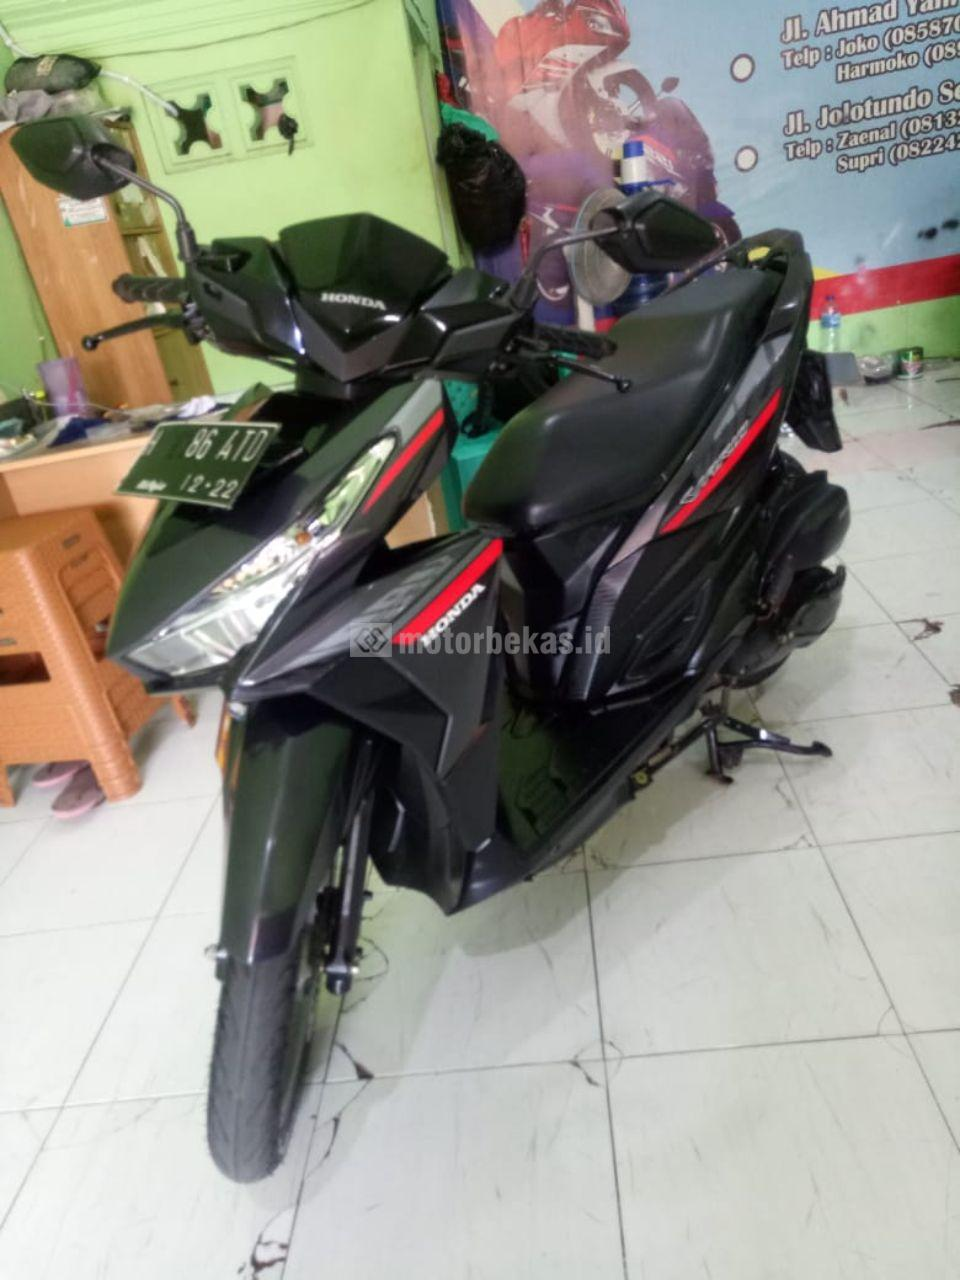 HONDA VARIO TECHNO 125  2529 motorbekas.id